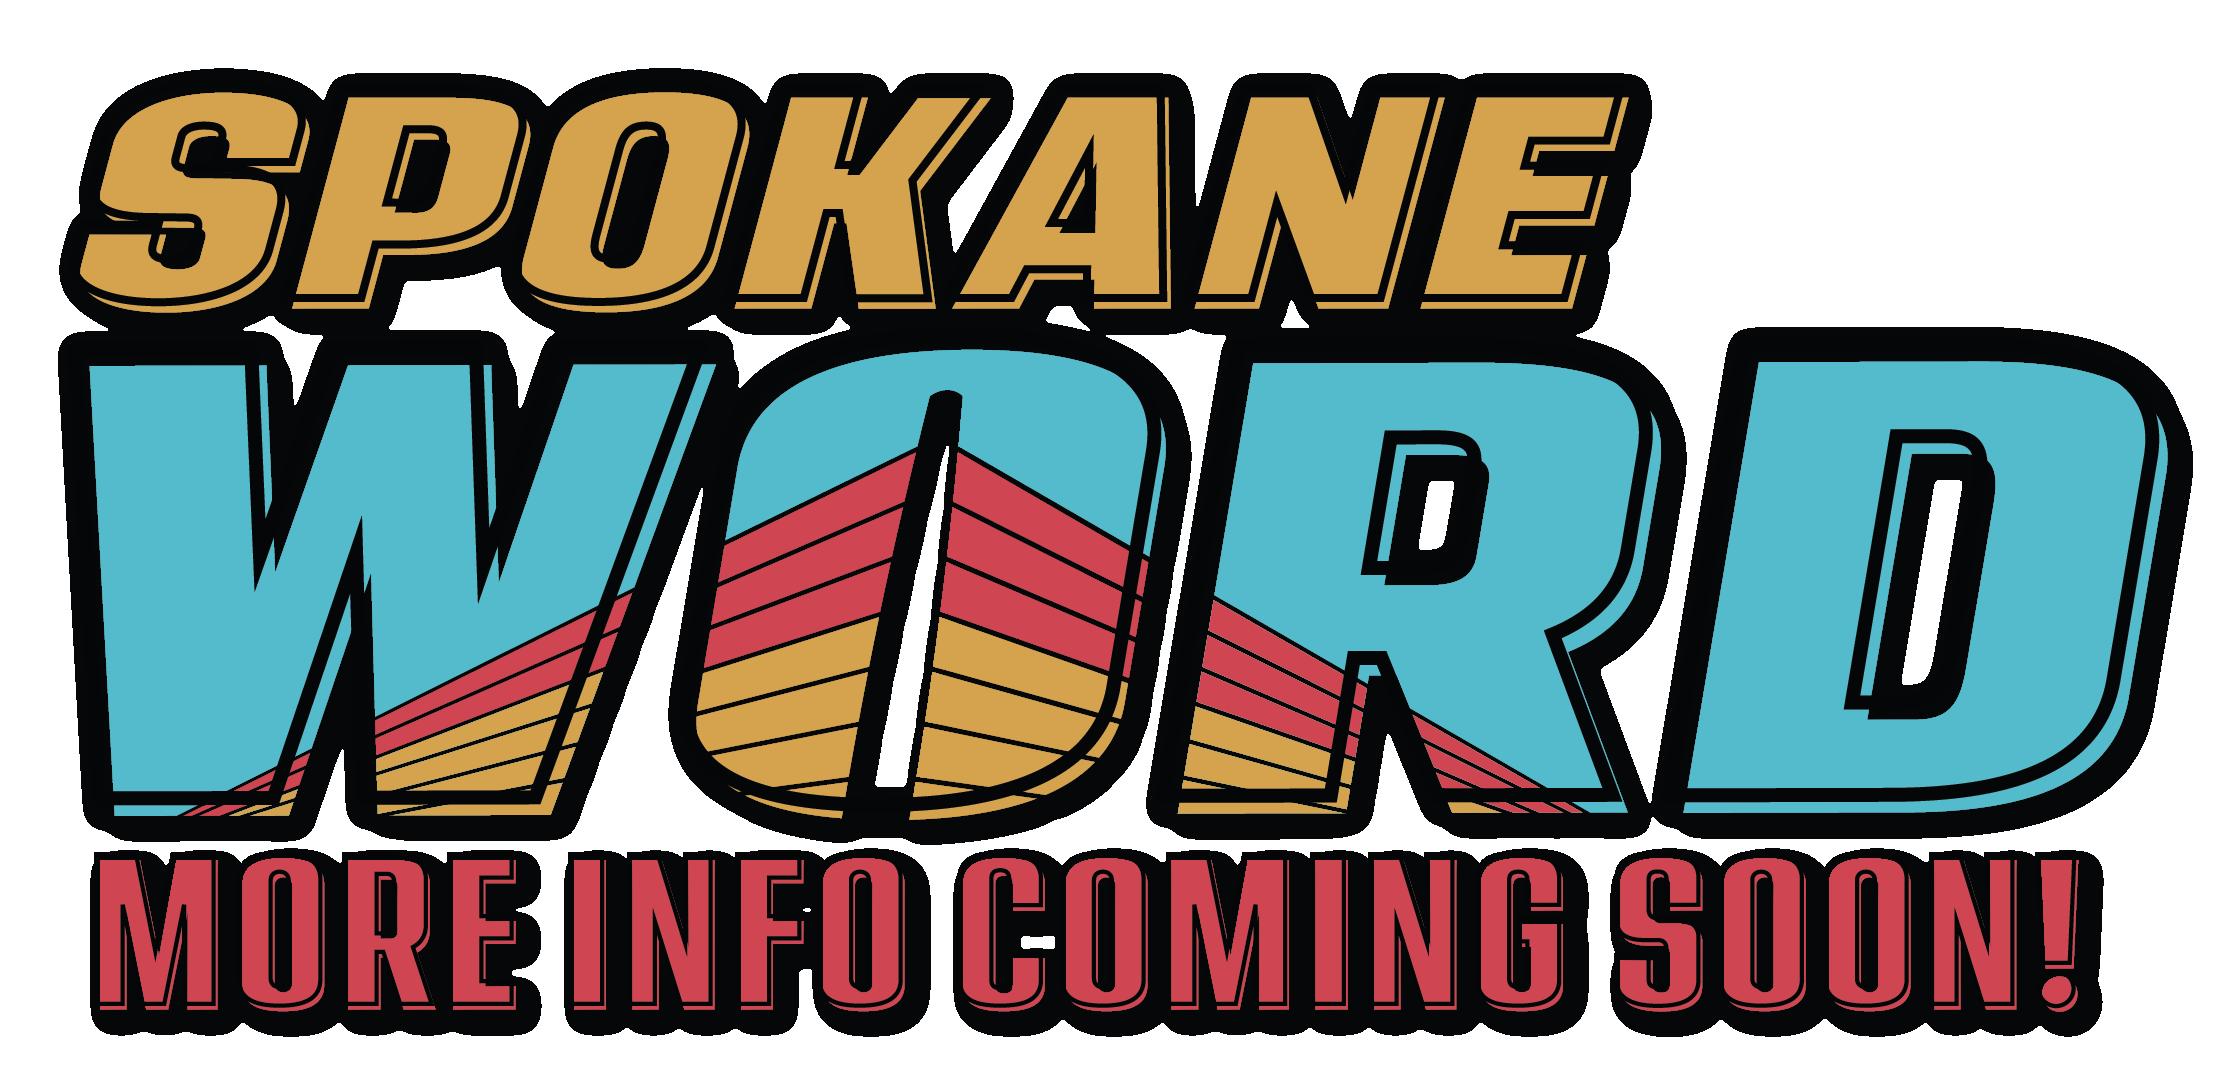 Spokane Word Logo - Coming Soon